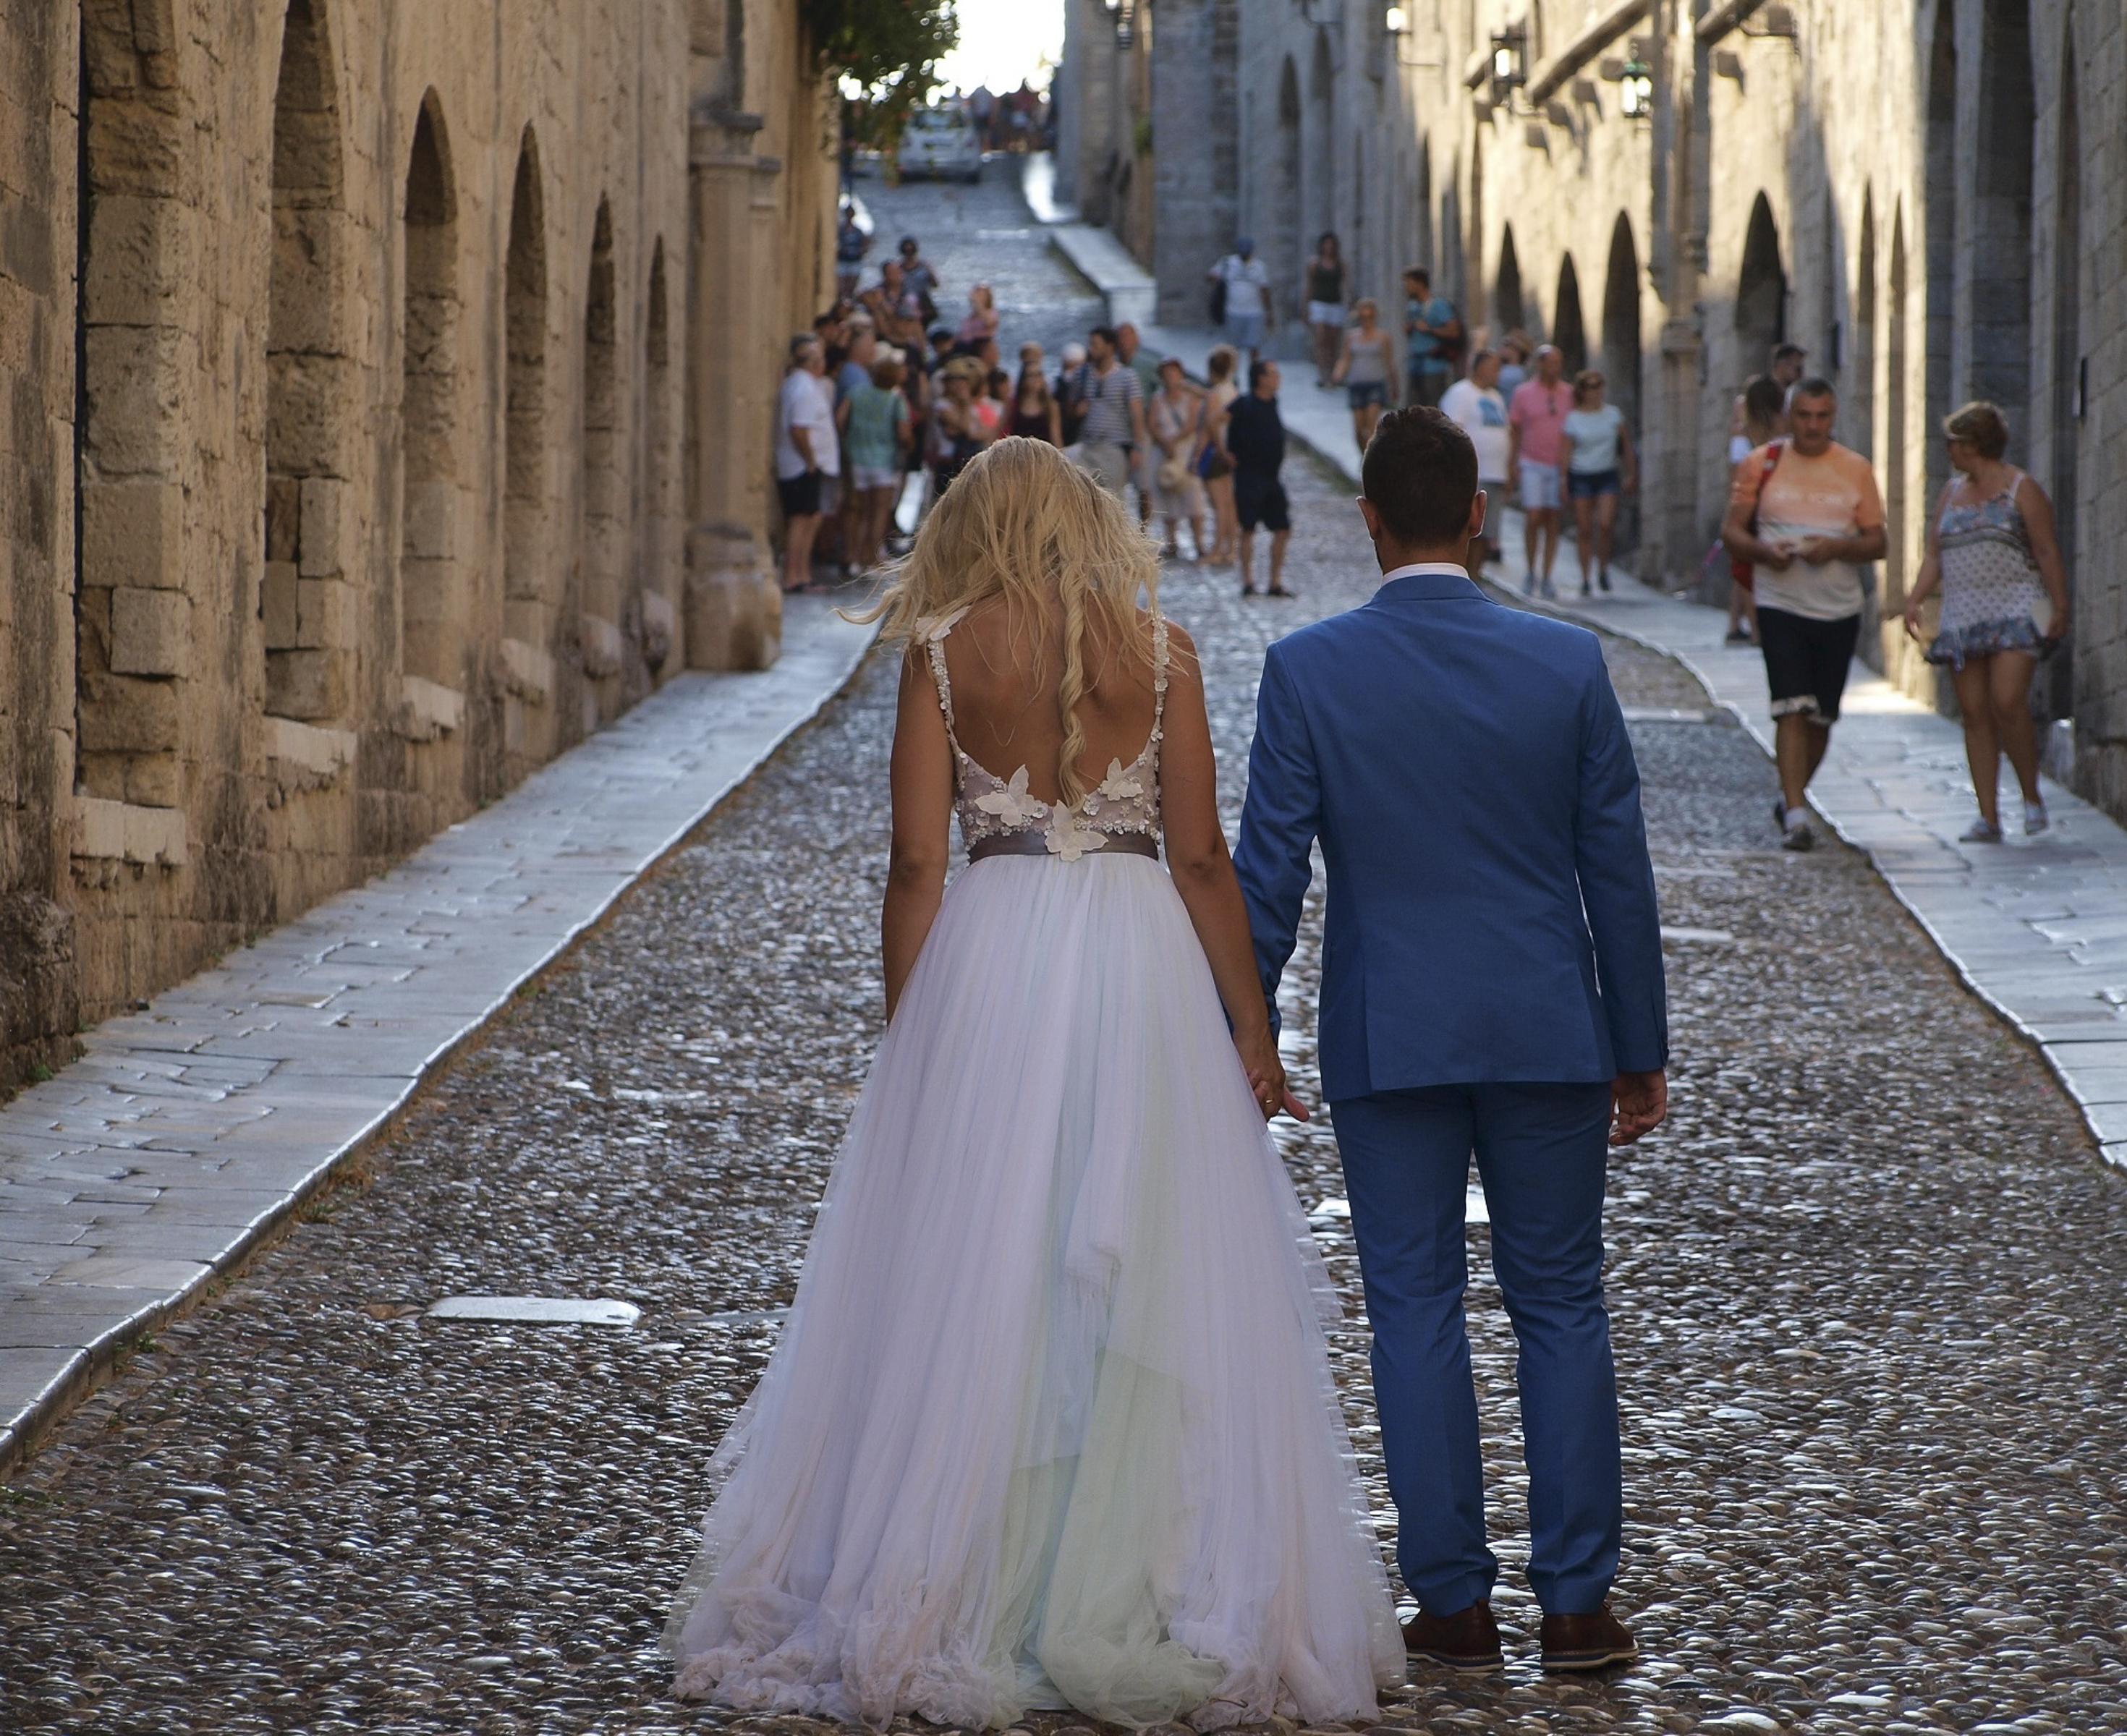 https://sleeklens.com/wp-content/uploads/2018/09/wedding-lightroom-presets-signature-bride-groom-before-7.jpg